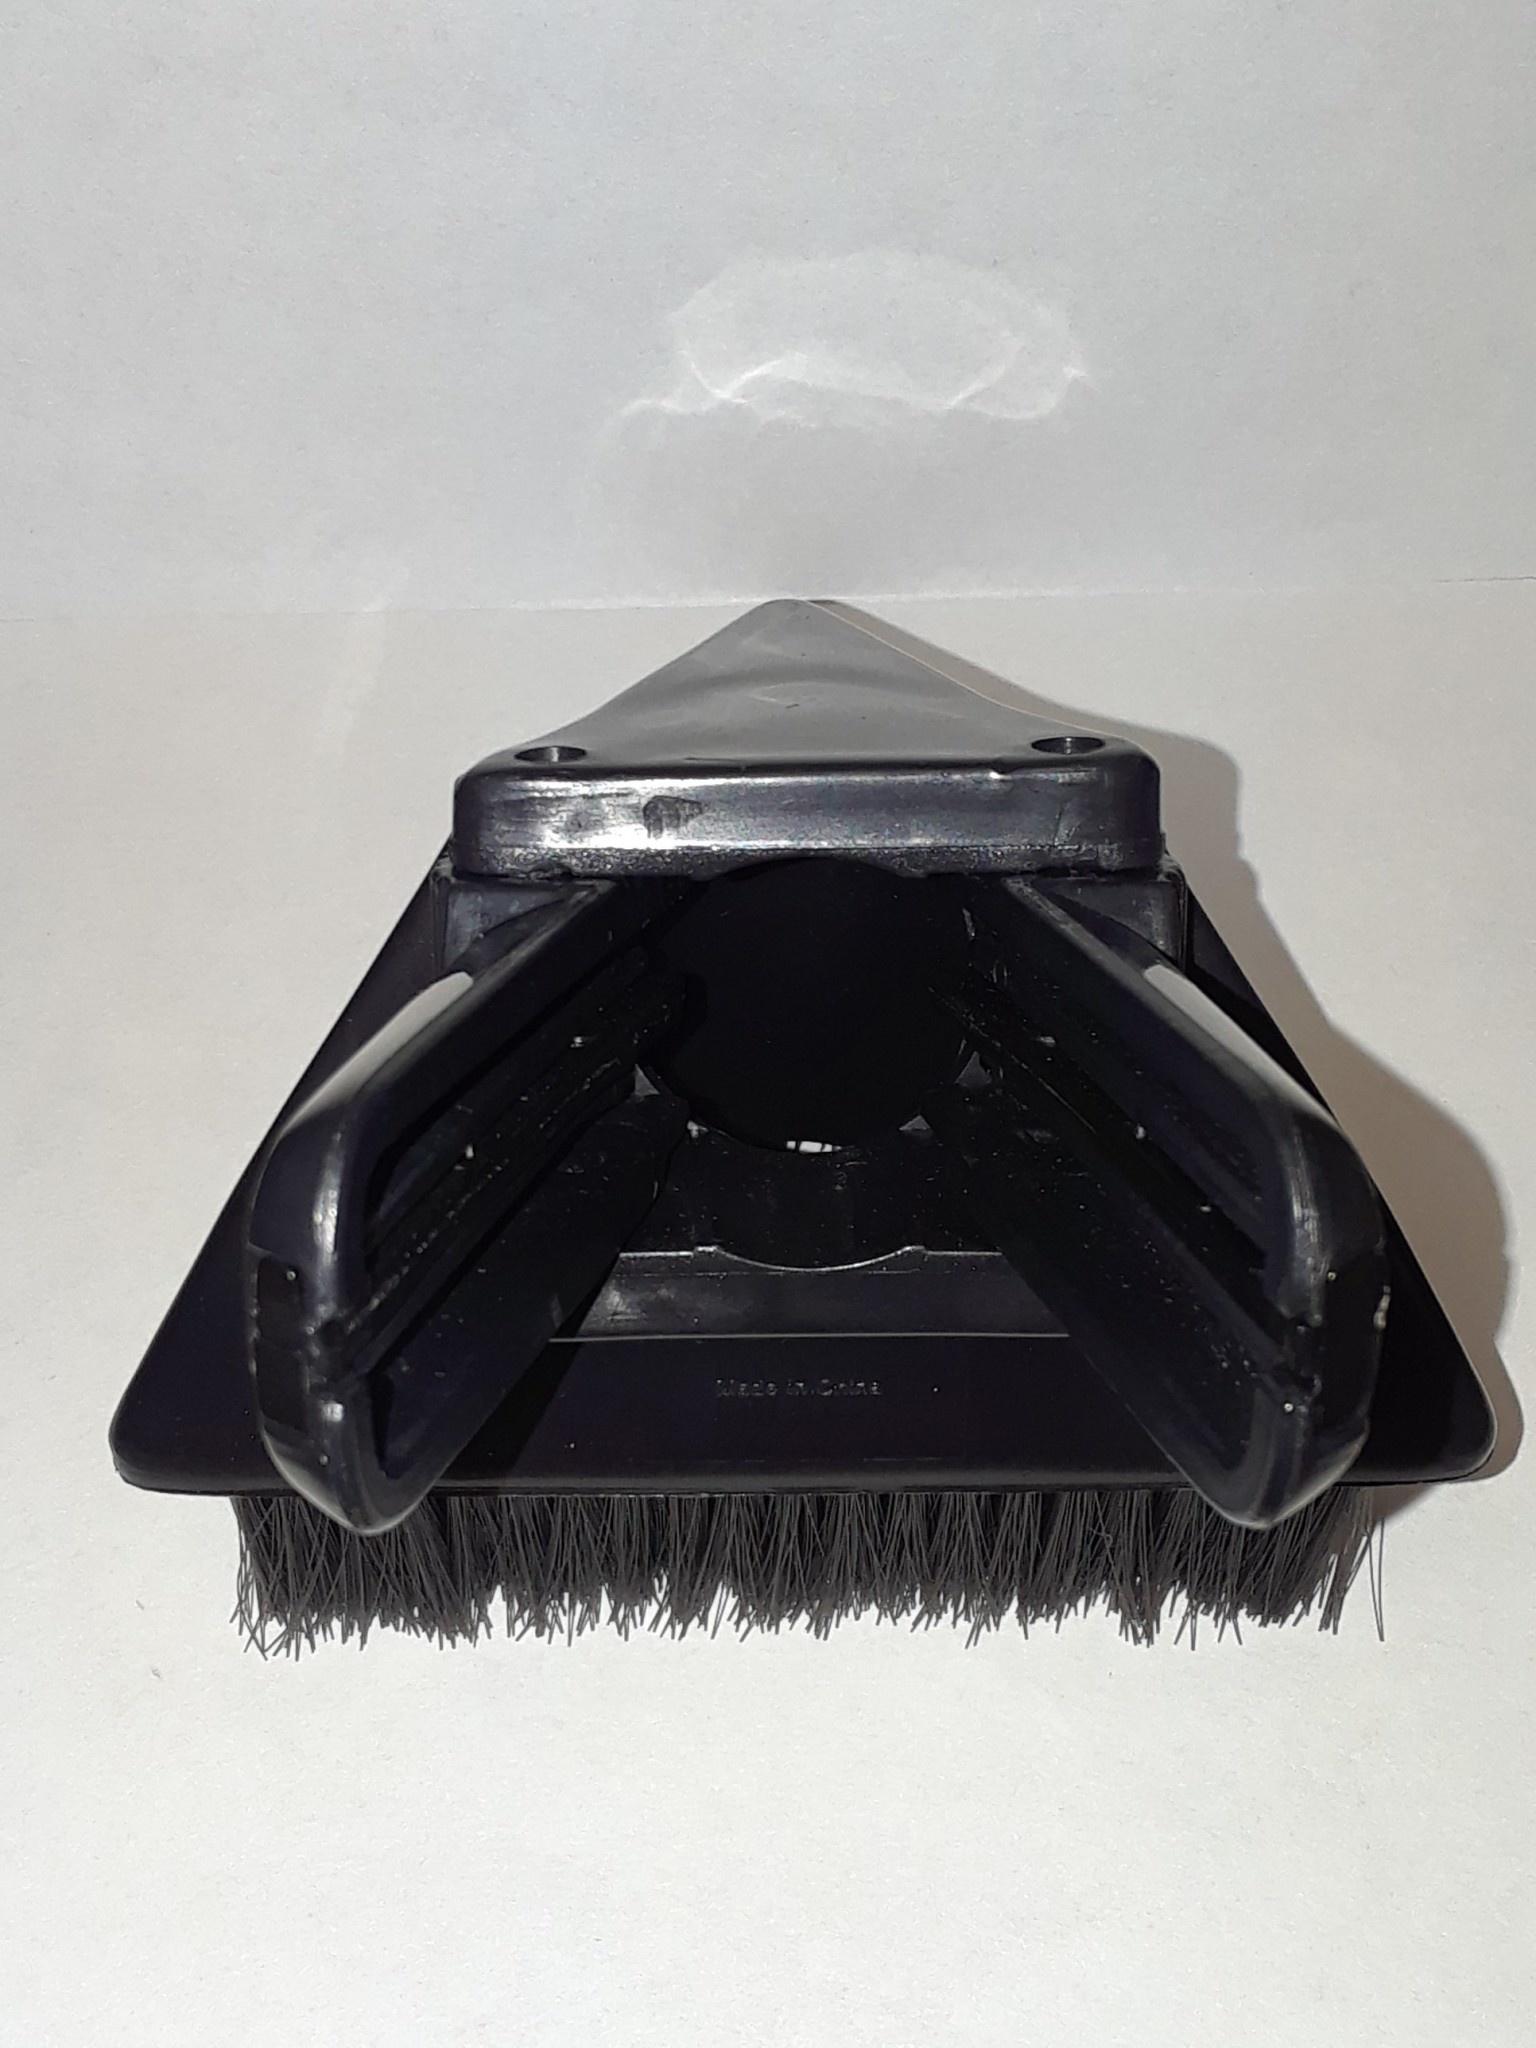 Eureka Central Vacuum Drapery & Corner Combo Tool